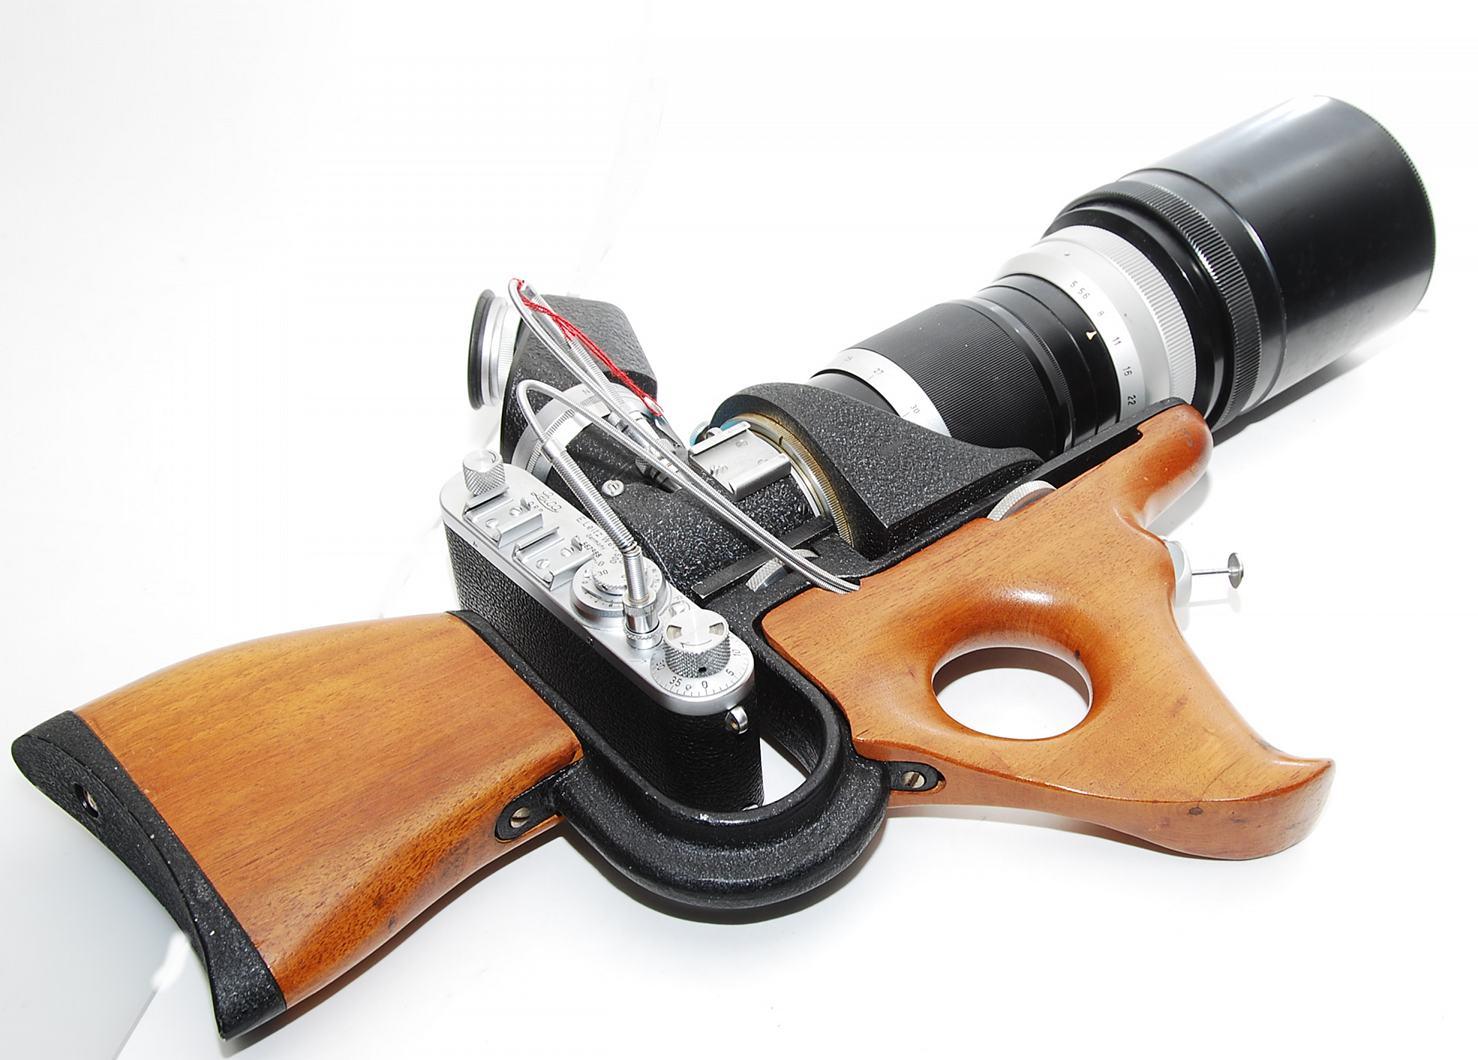 camera-gun-11.jpg